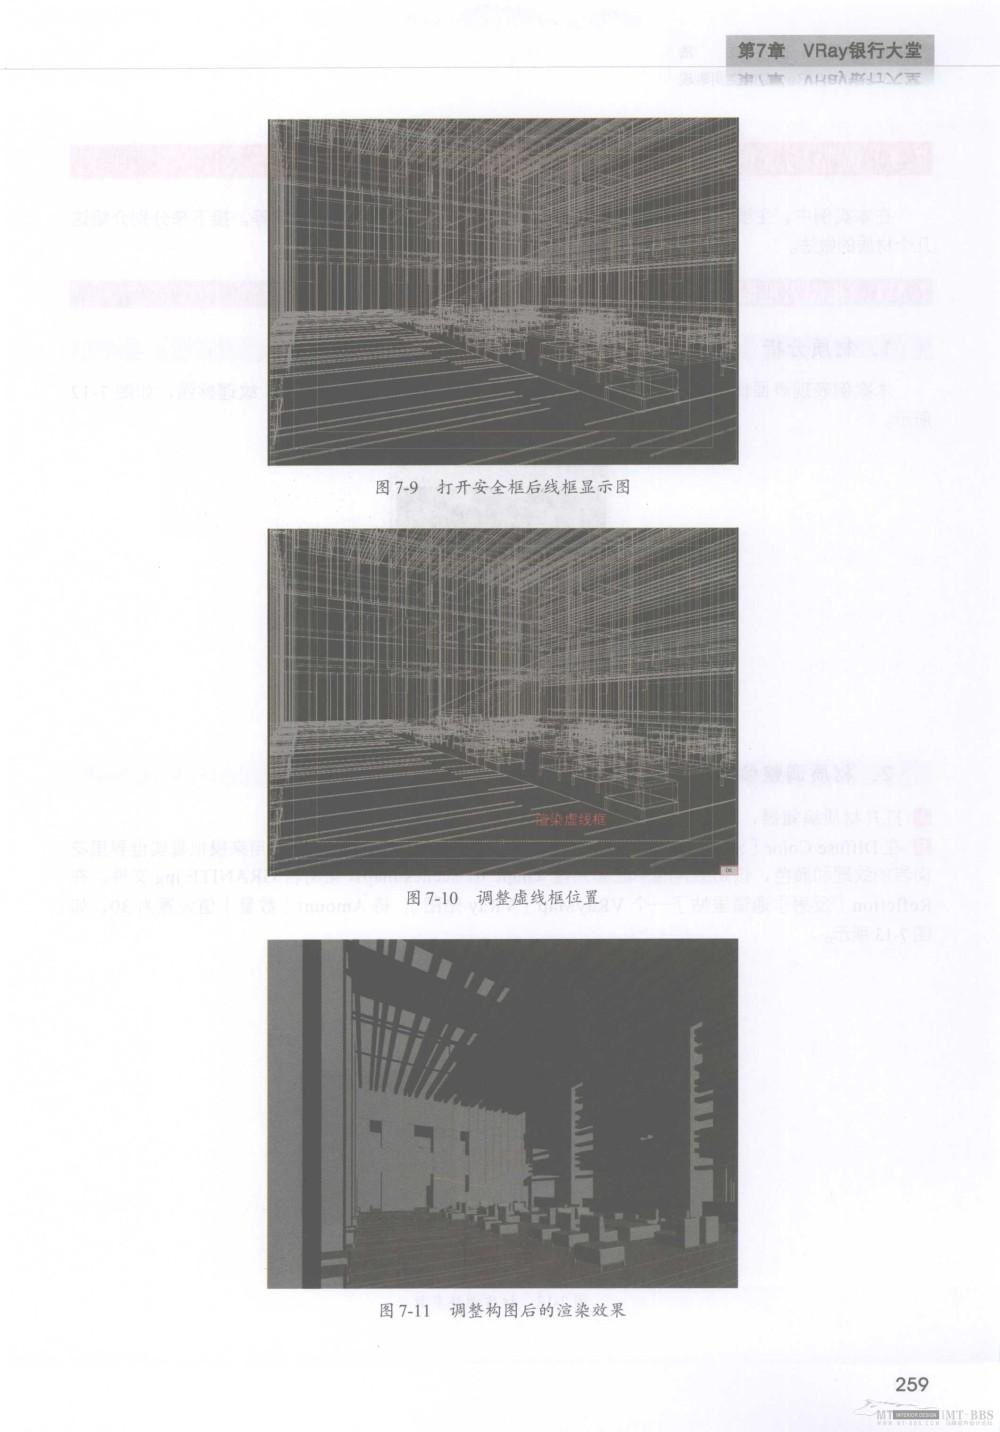 水晶石技法-3ds_Max&VRay室内空间表现_水晶石技法-3ds_Max&VRay室内空间表现_页面_265.jpg